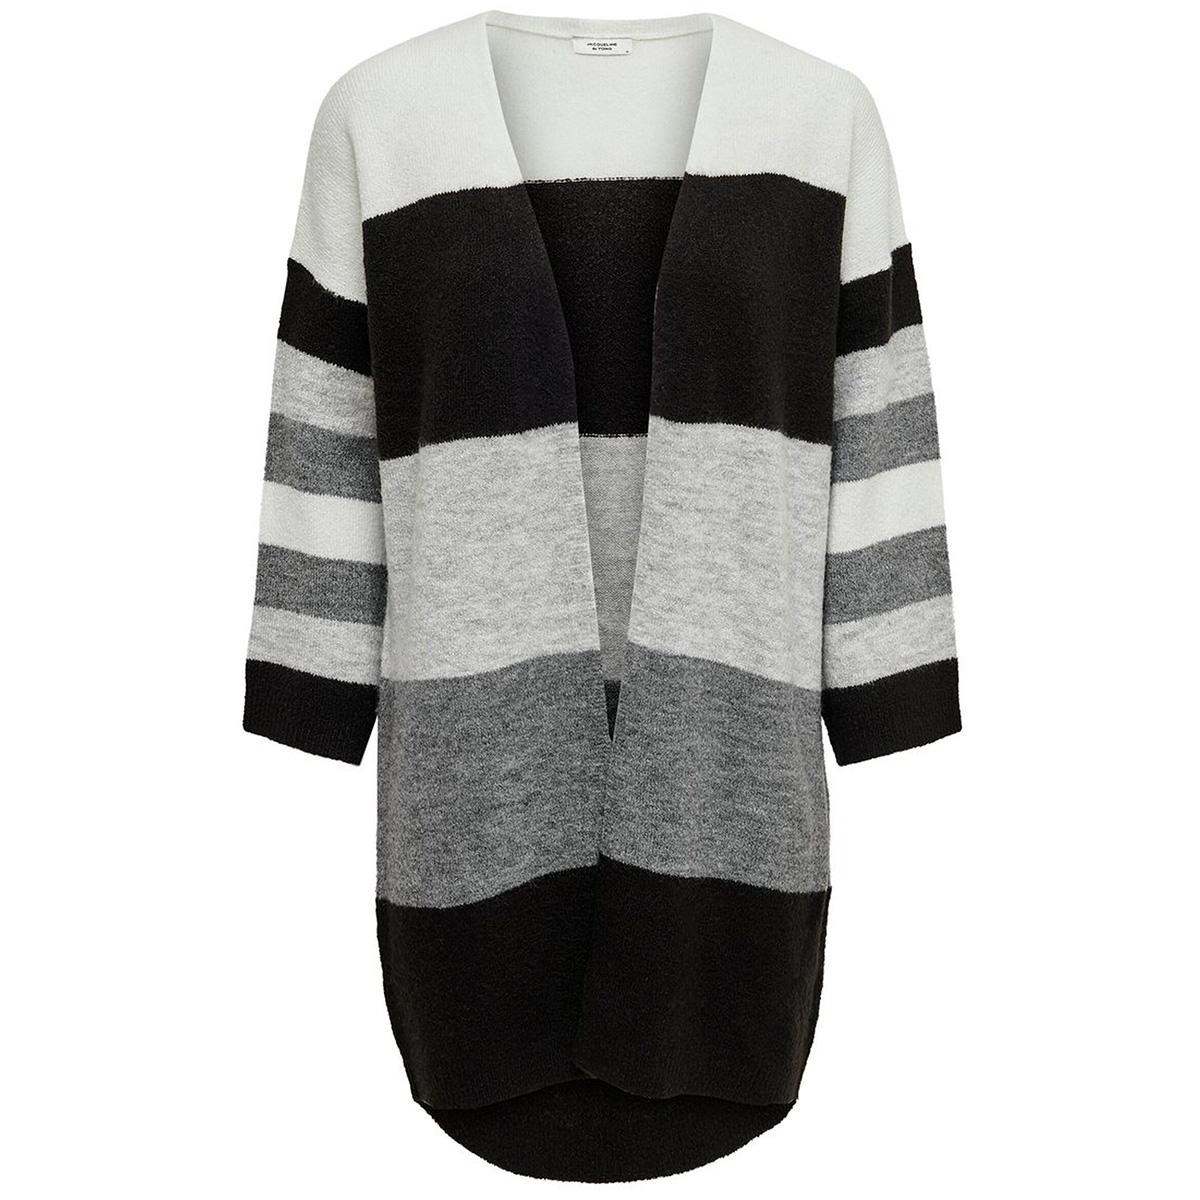 jdynora treats 7/8 cardigan knt 15176719 jacqueline de yong vest dark grey melan/stripe